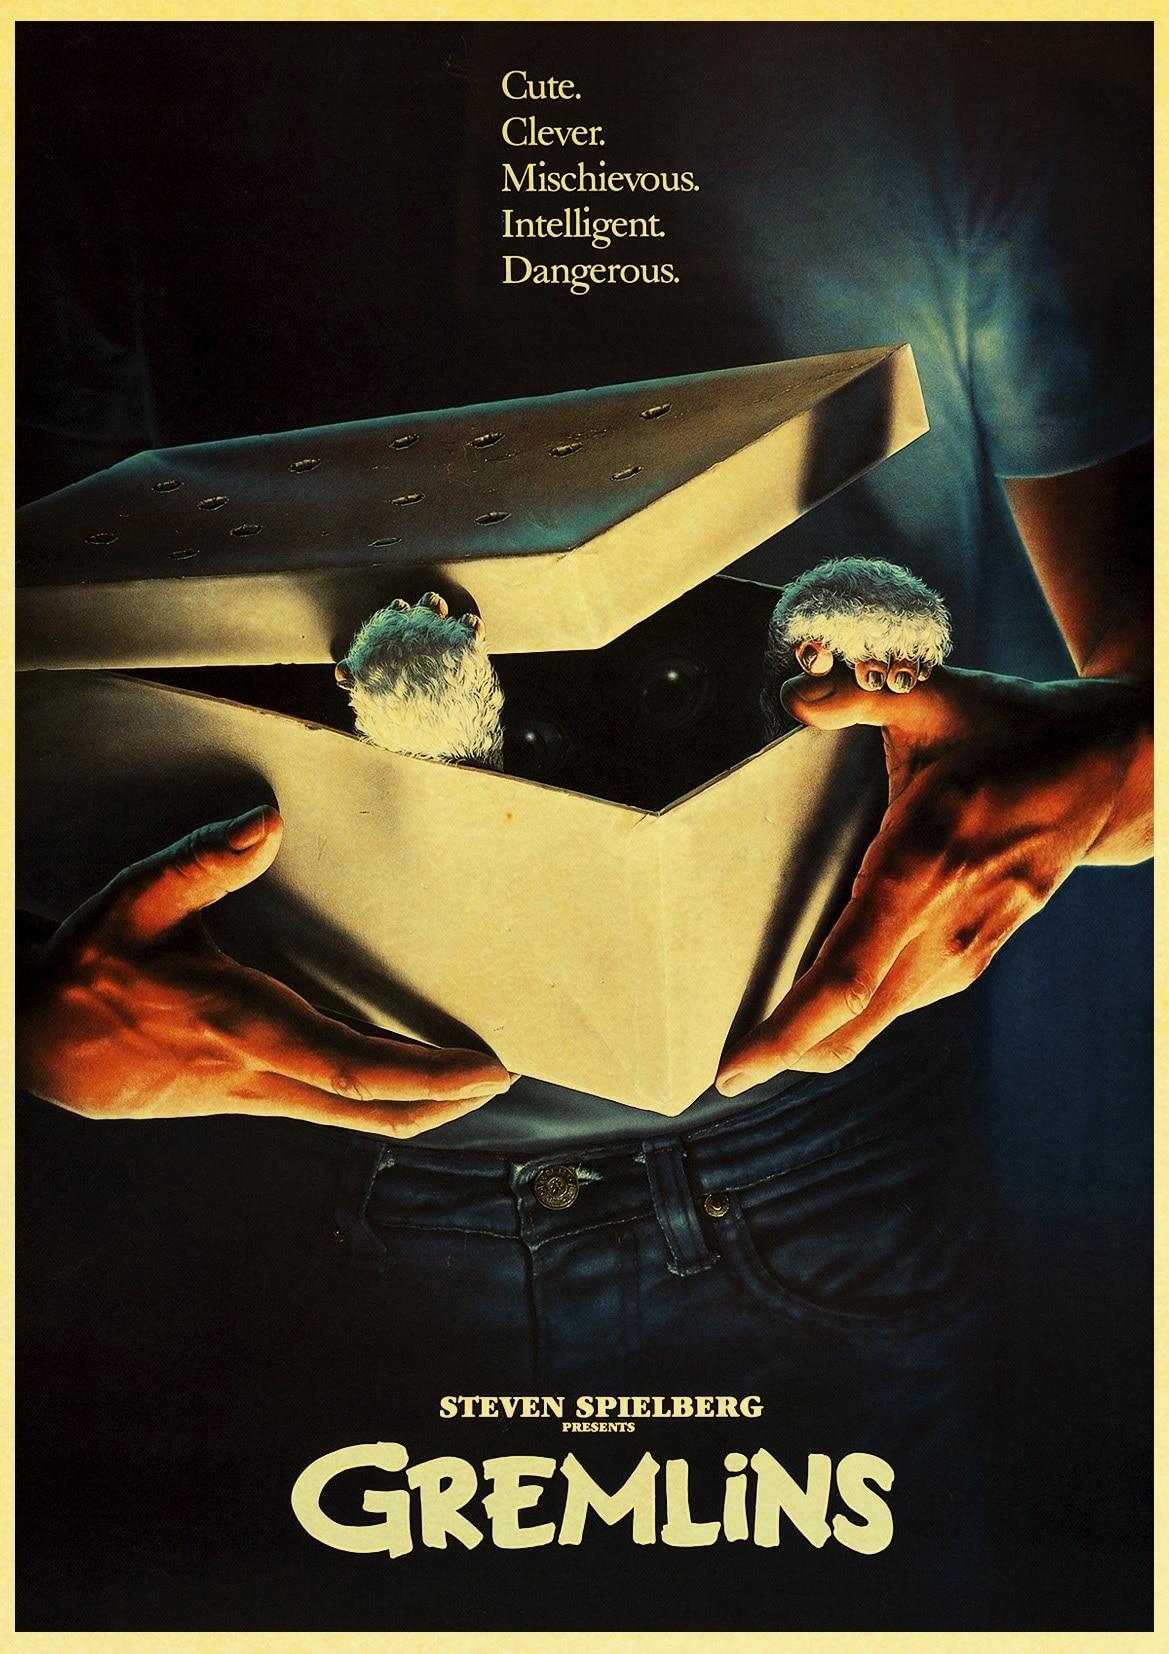 Frankenstein 24x36inch Old Horror Movie Silk Poster Art Print Shop Room Decal